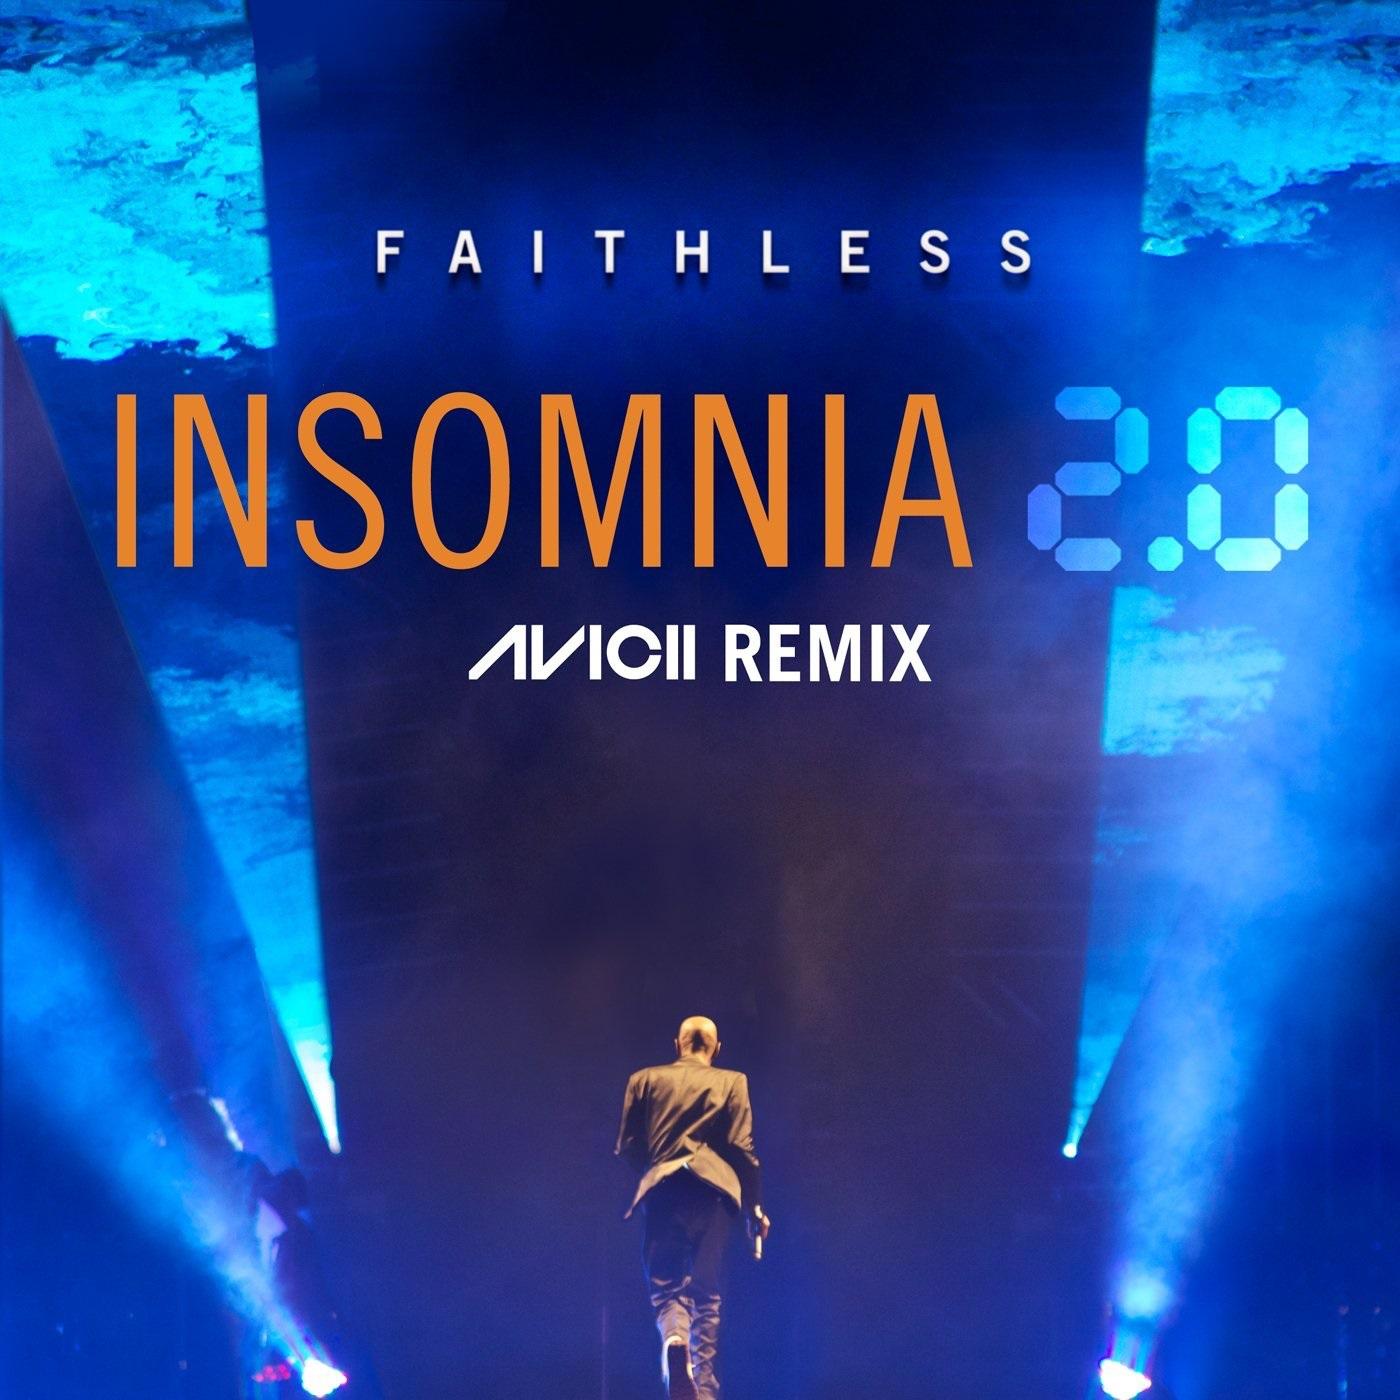 Faithless – Insomnia 2.0 – Avicii Remix (Video)